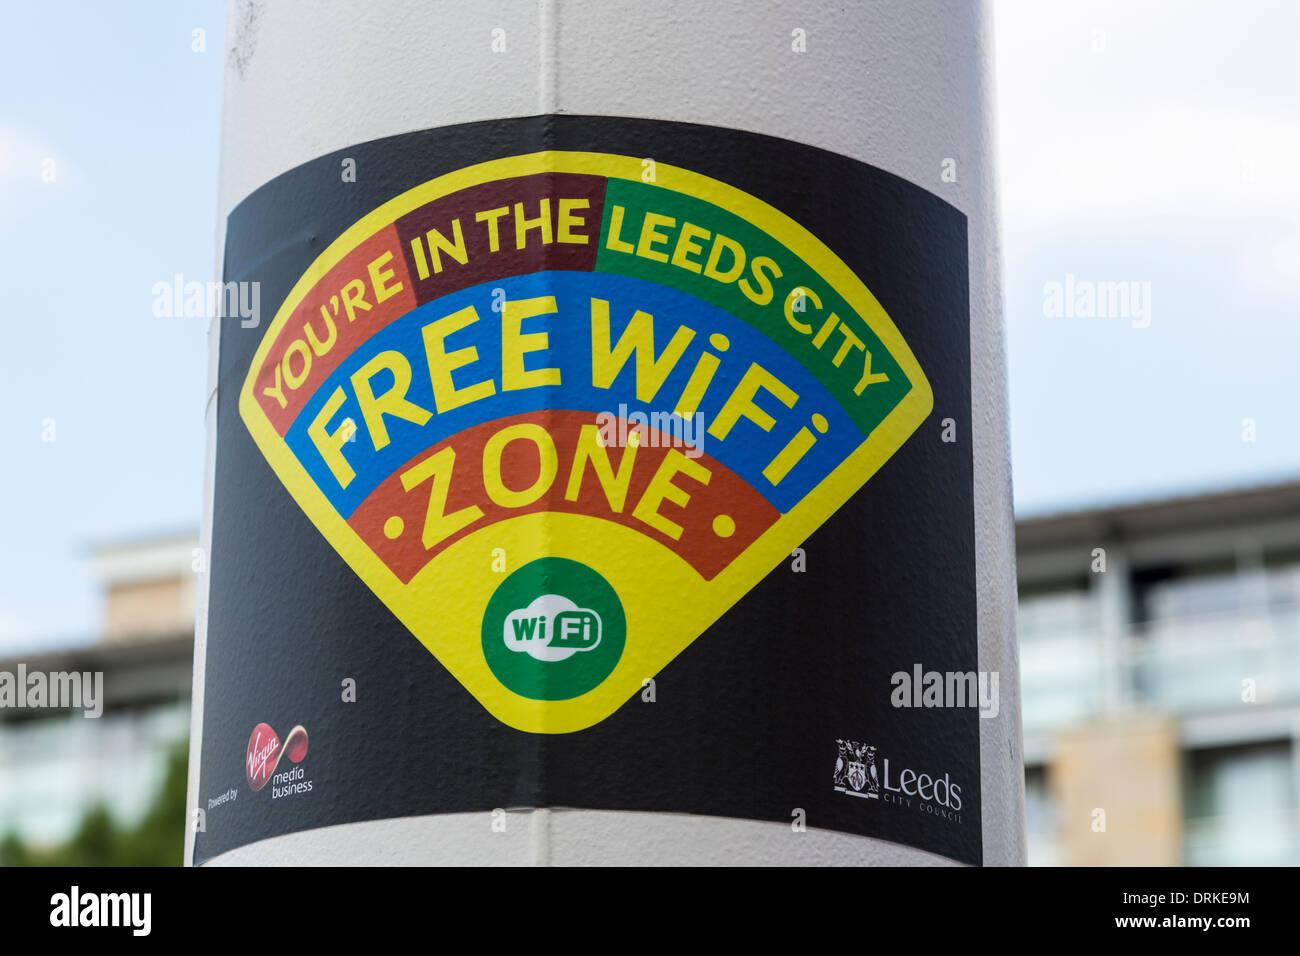 Señal wifi gratuita frente de Civic Hall, Leeds, Inglaterra Imagen De Stock